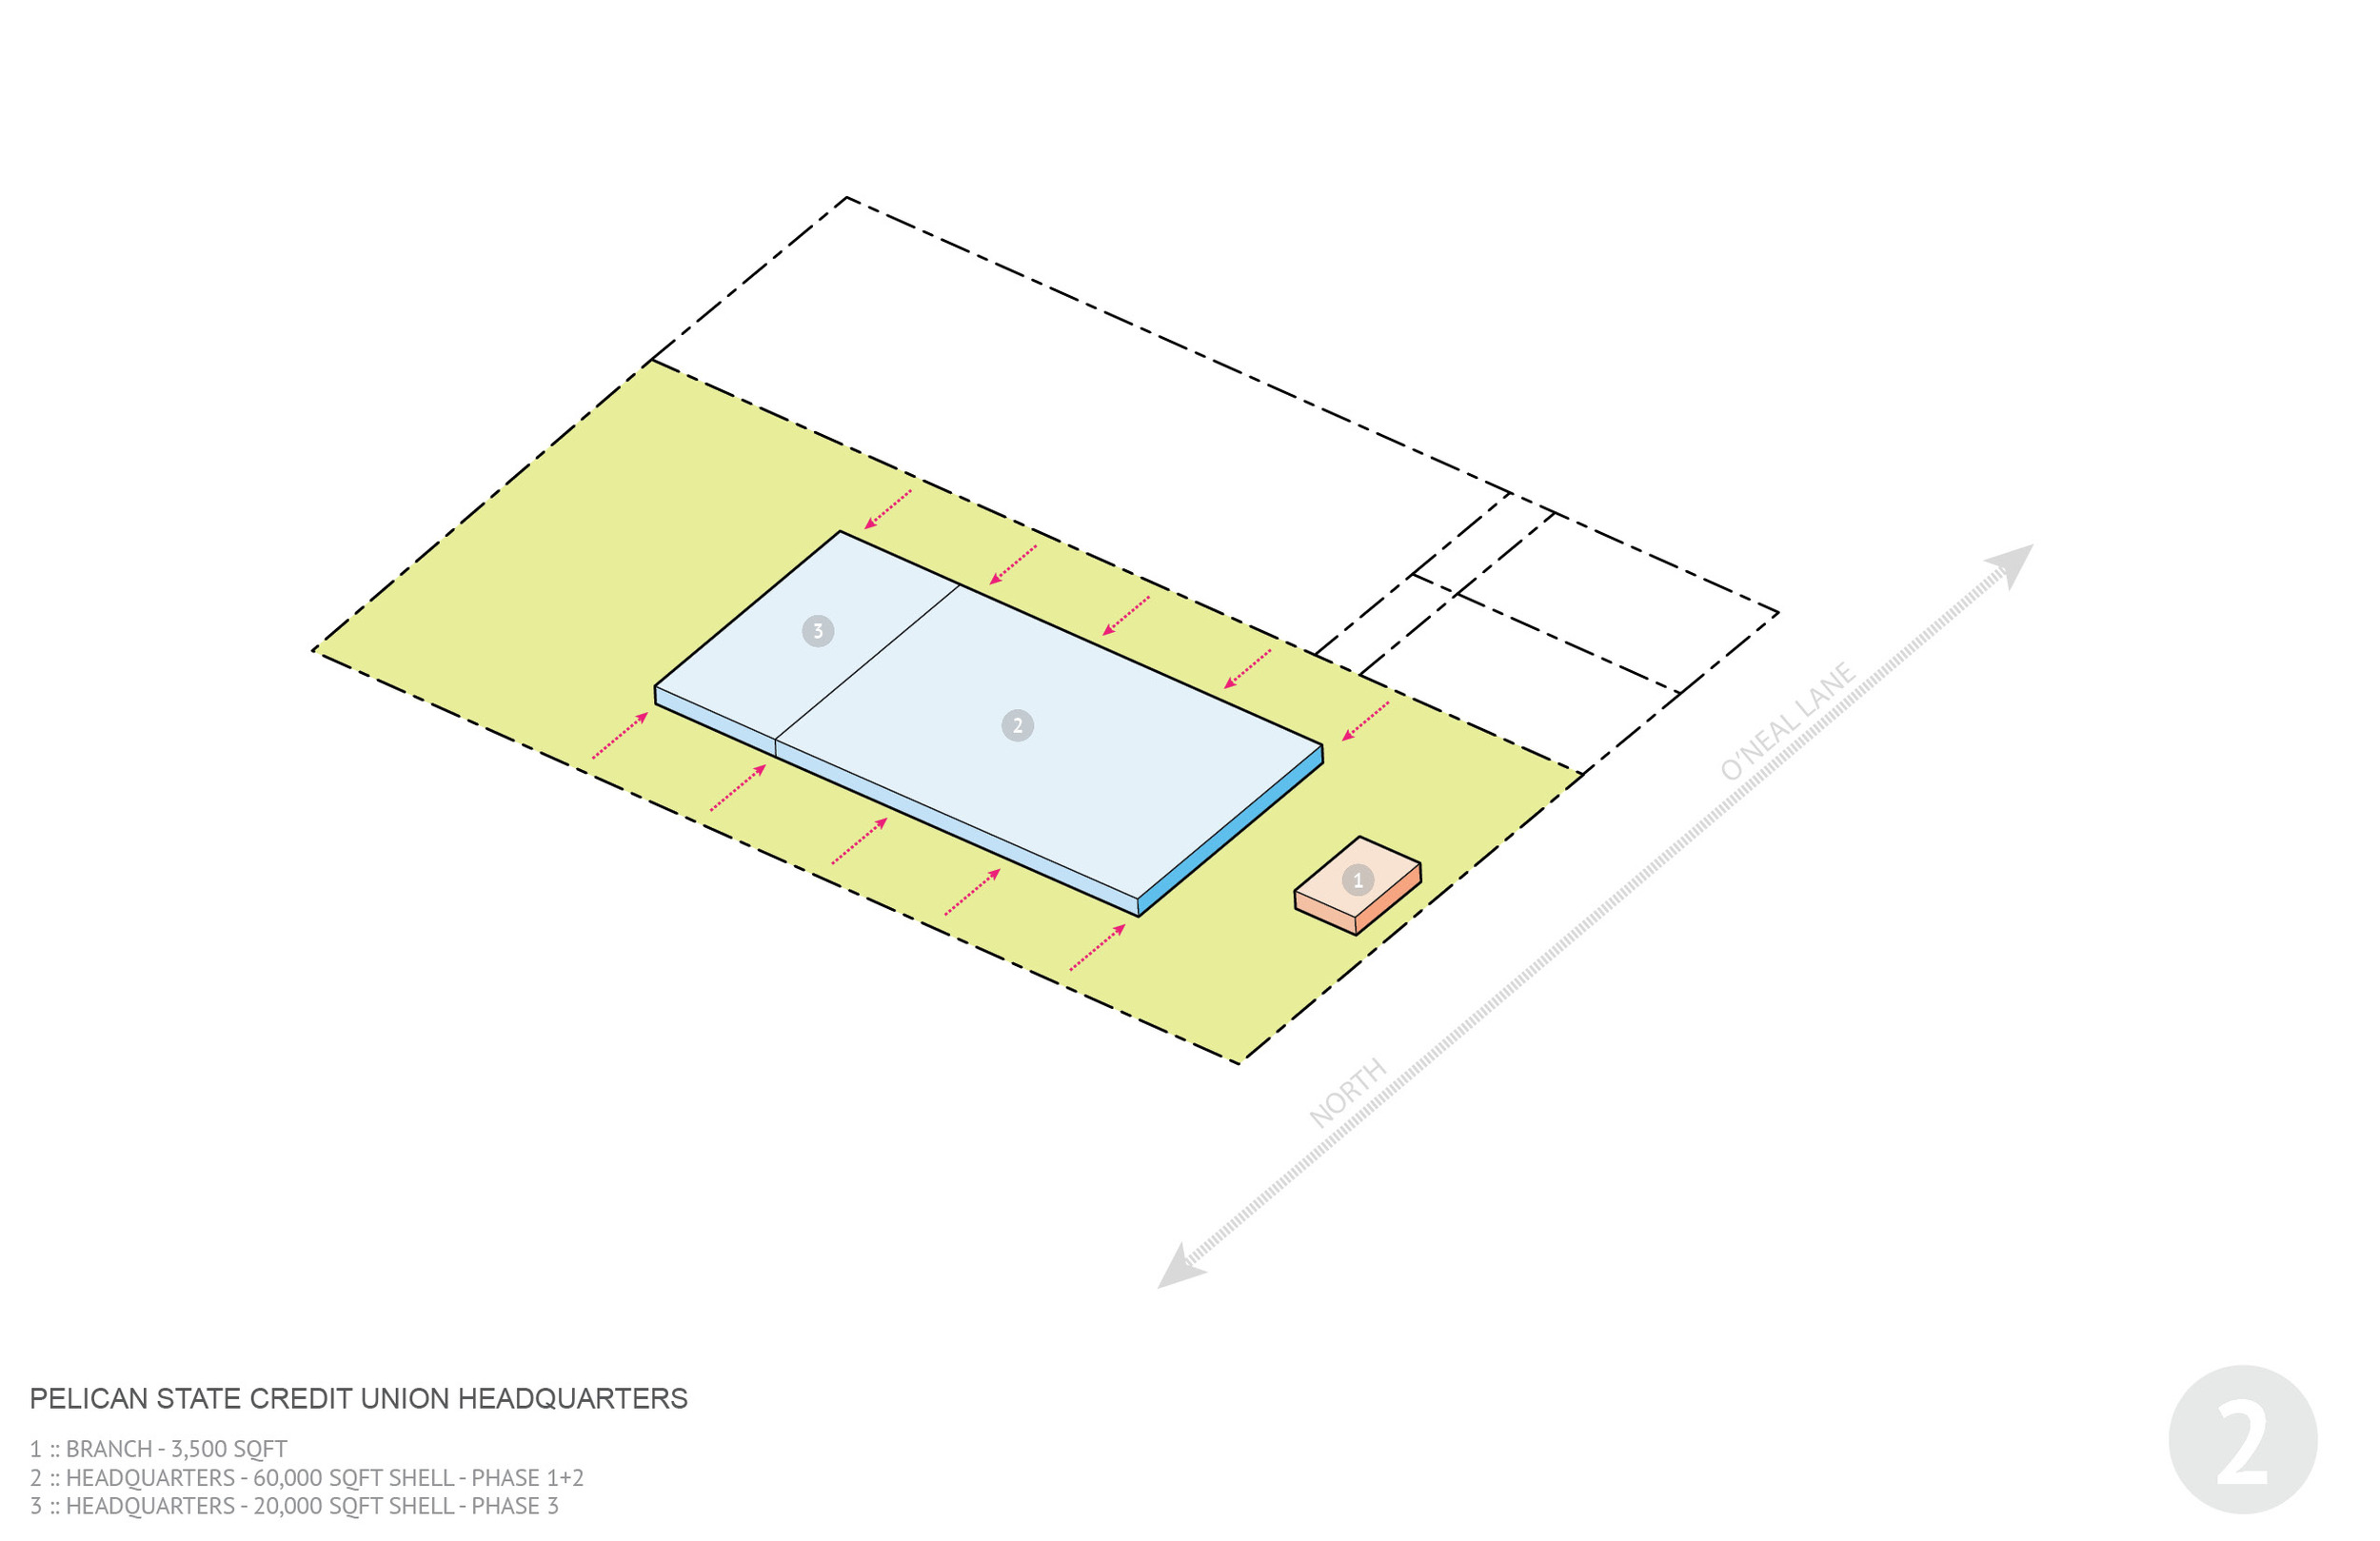 A_SlideshowDiagram_2.jpg